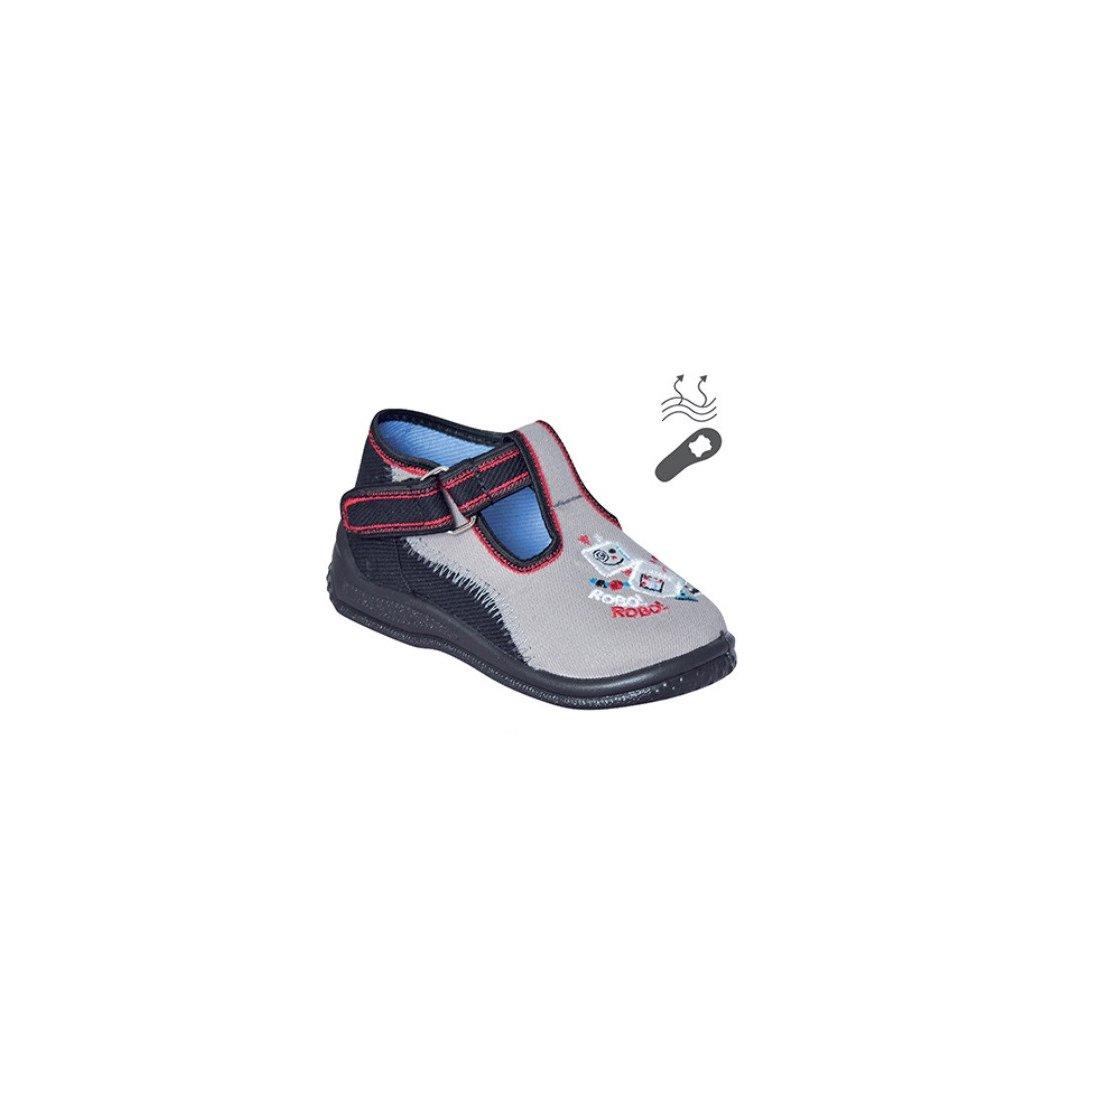 ae38cb66f35 Zetpol - Детски текстилни обувки Толек 1963